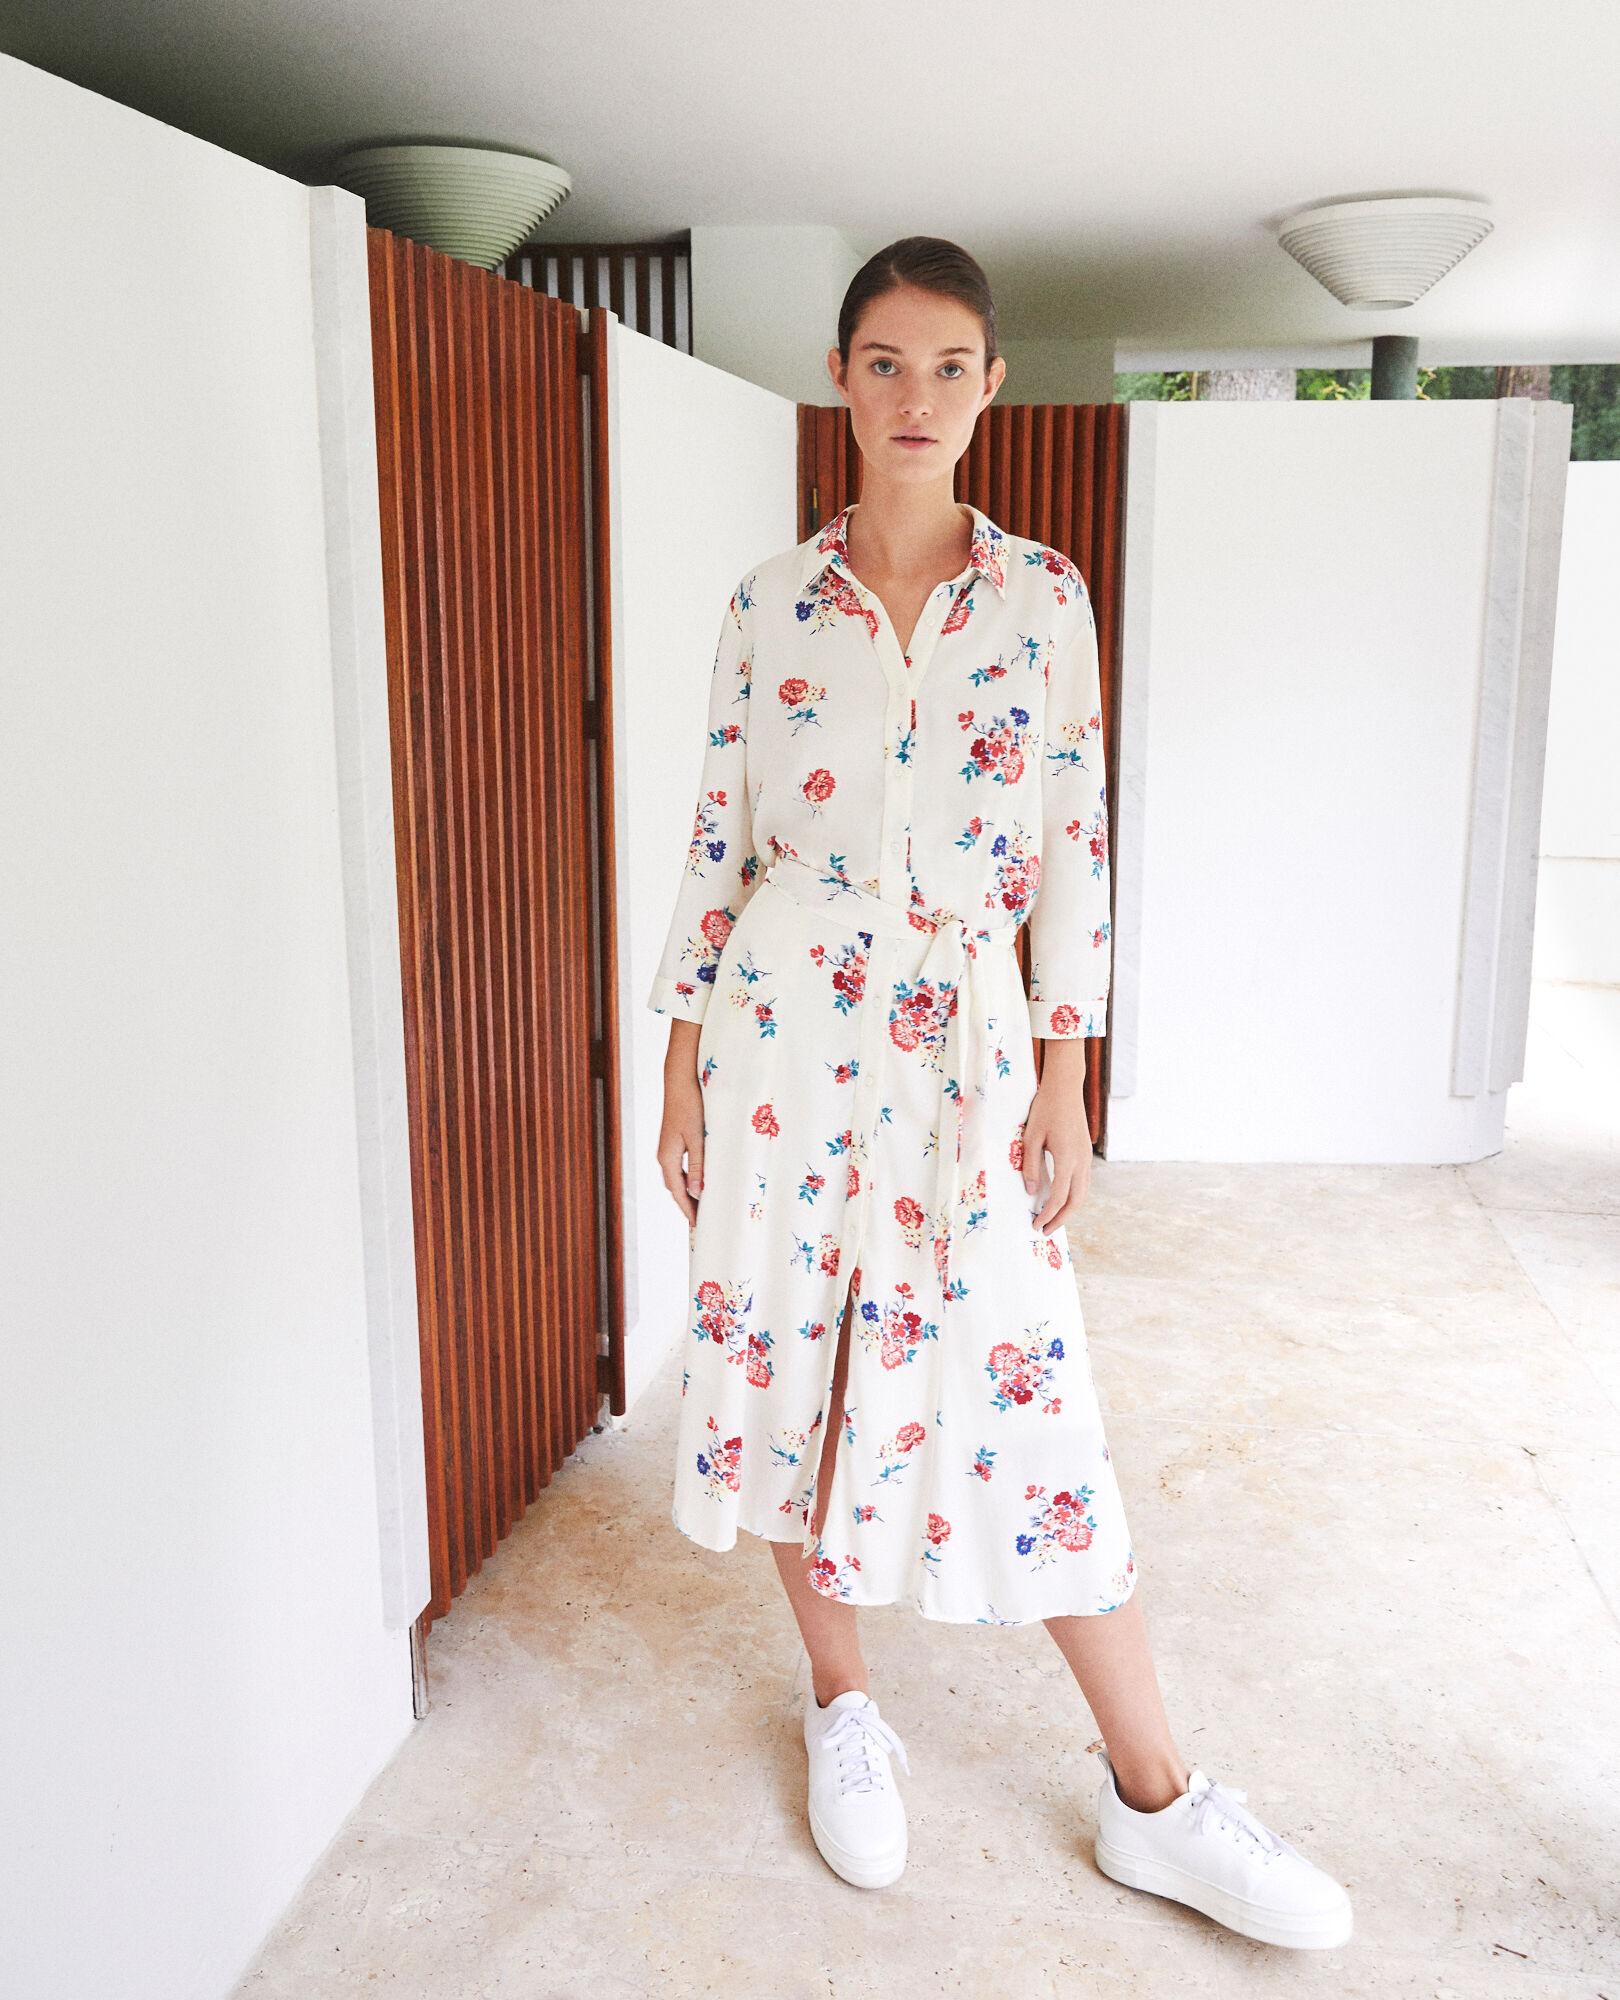 Robes Combinaisons Soldes Jusqu'à Femme amp; Taille 42xl 50 Faaqdp